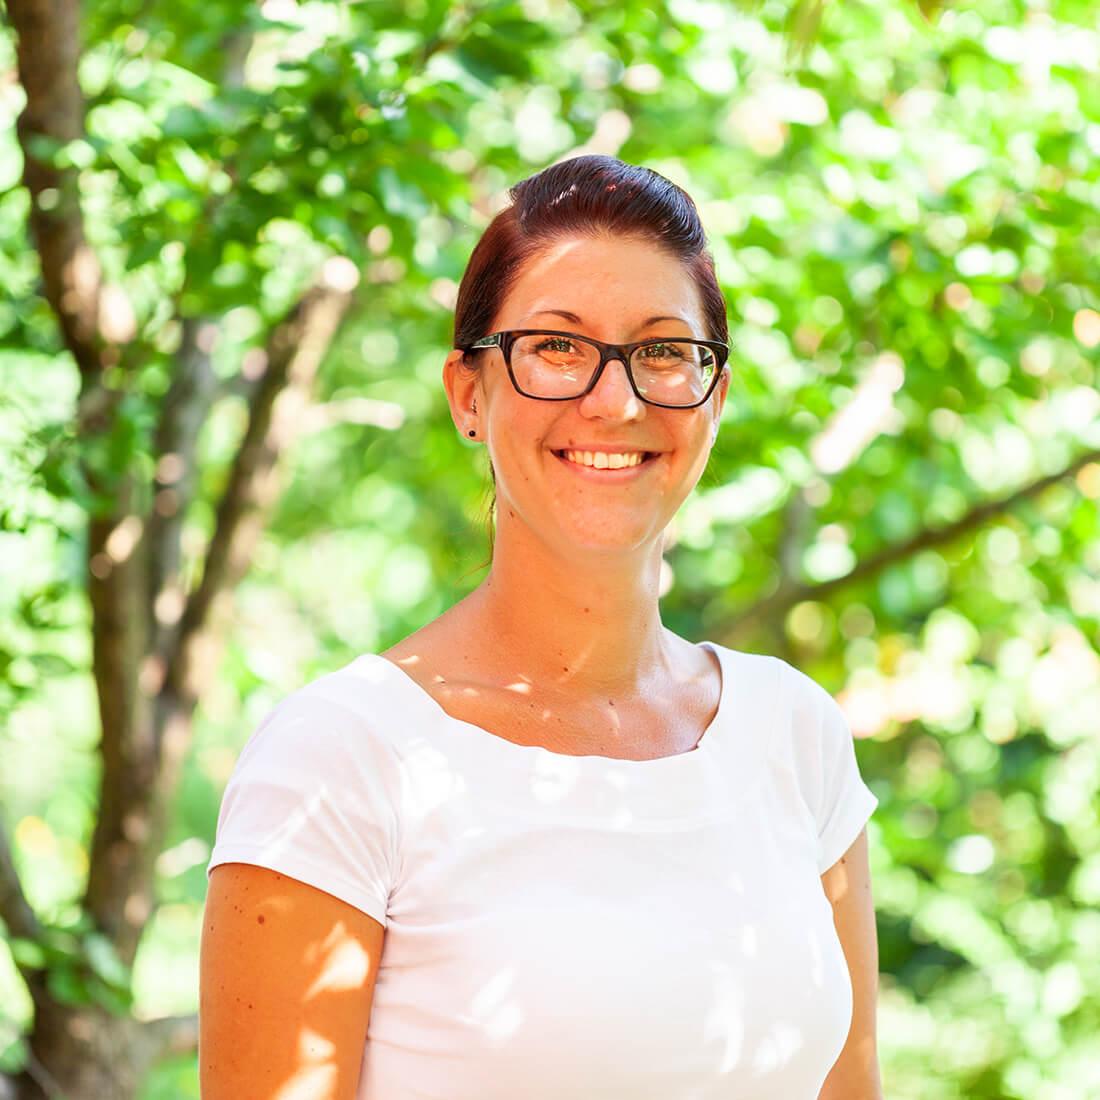 Hausarzt Bernhardsthal - Neugebauer - Team - Petra Fleckl